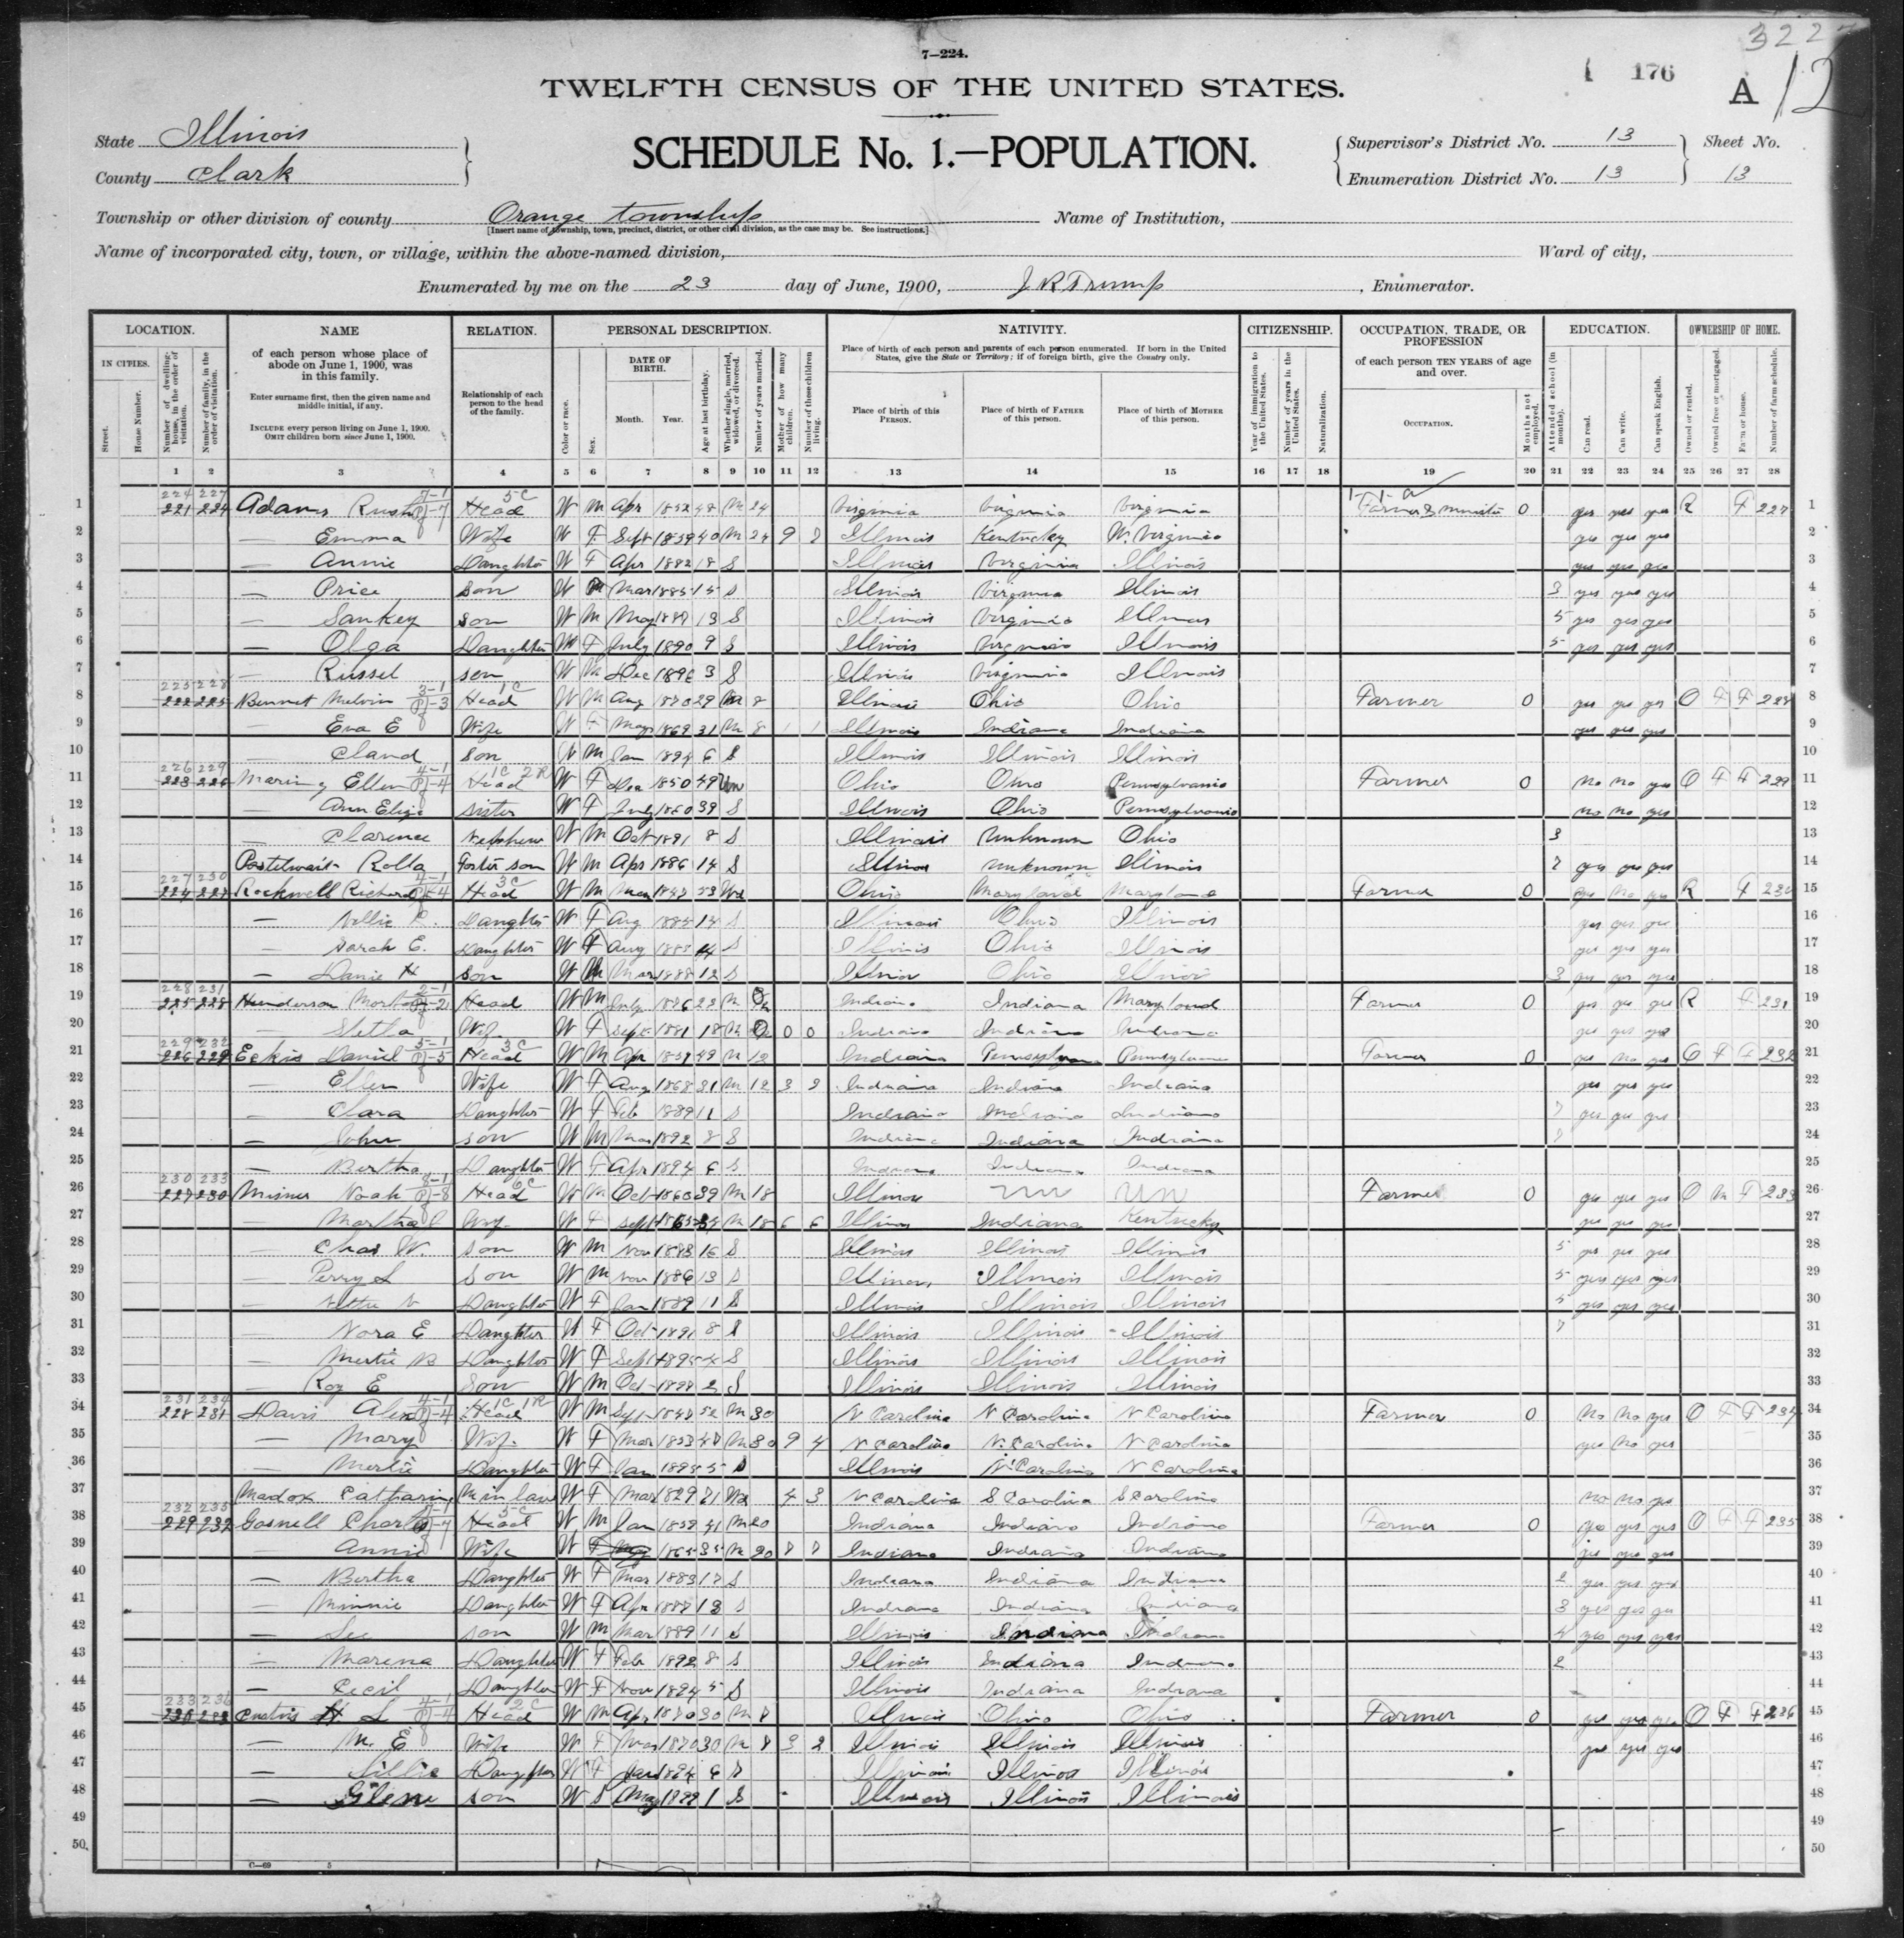 Illinois: CLARK County, Enumeration District 13, Sheet No. 13A